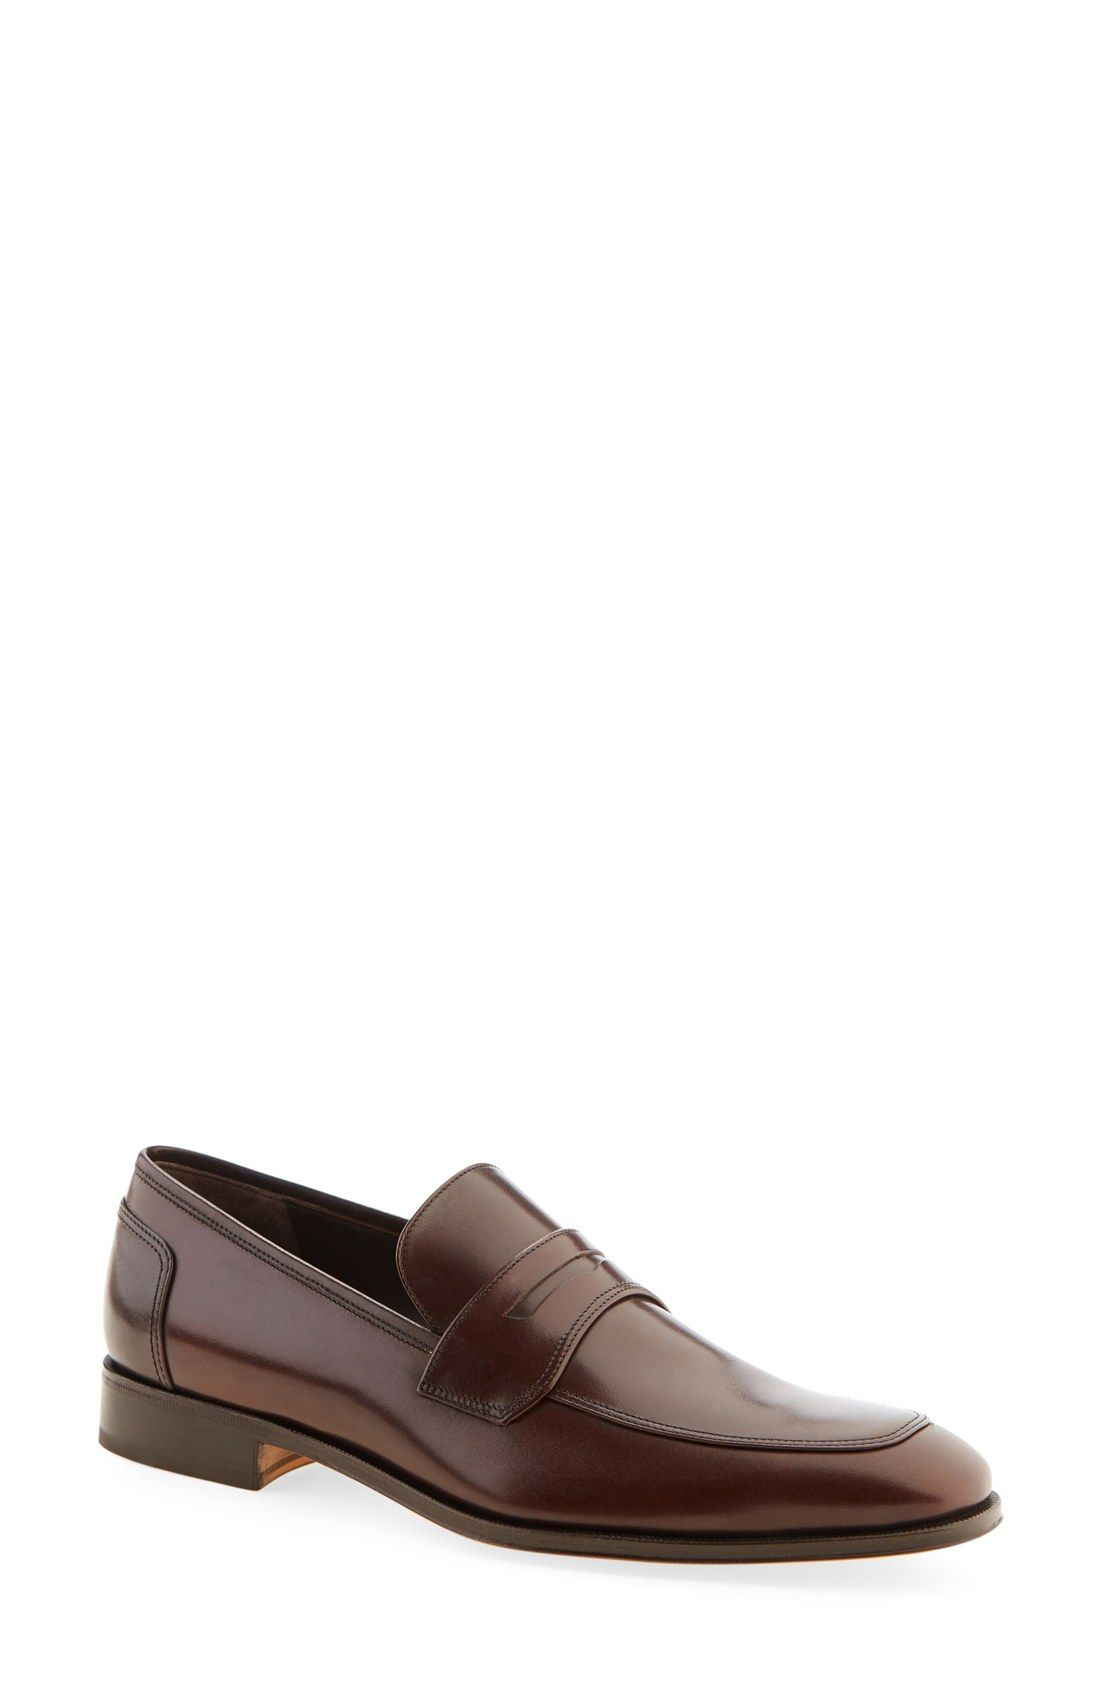 Salvatore Ferragamo Brown Shoes - Made In Italy - Elite Luxury Brand